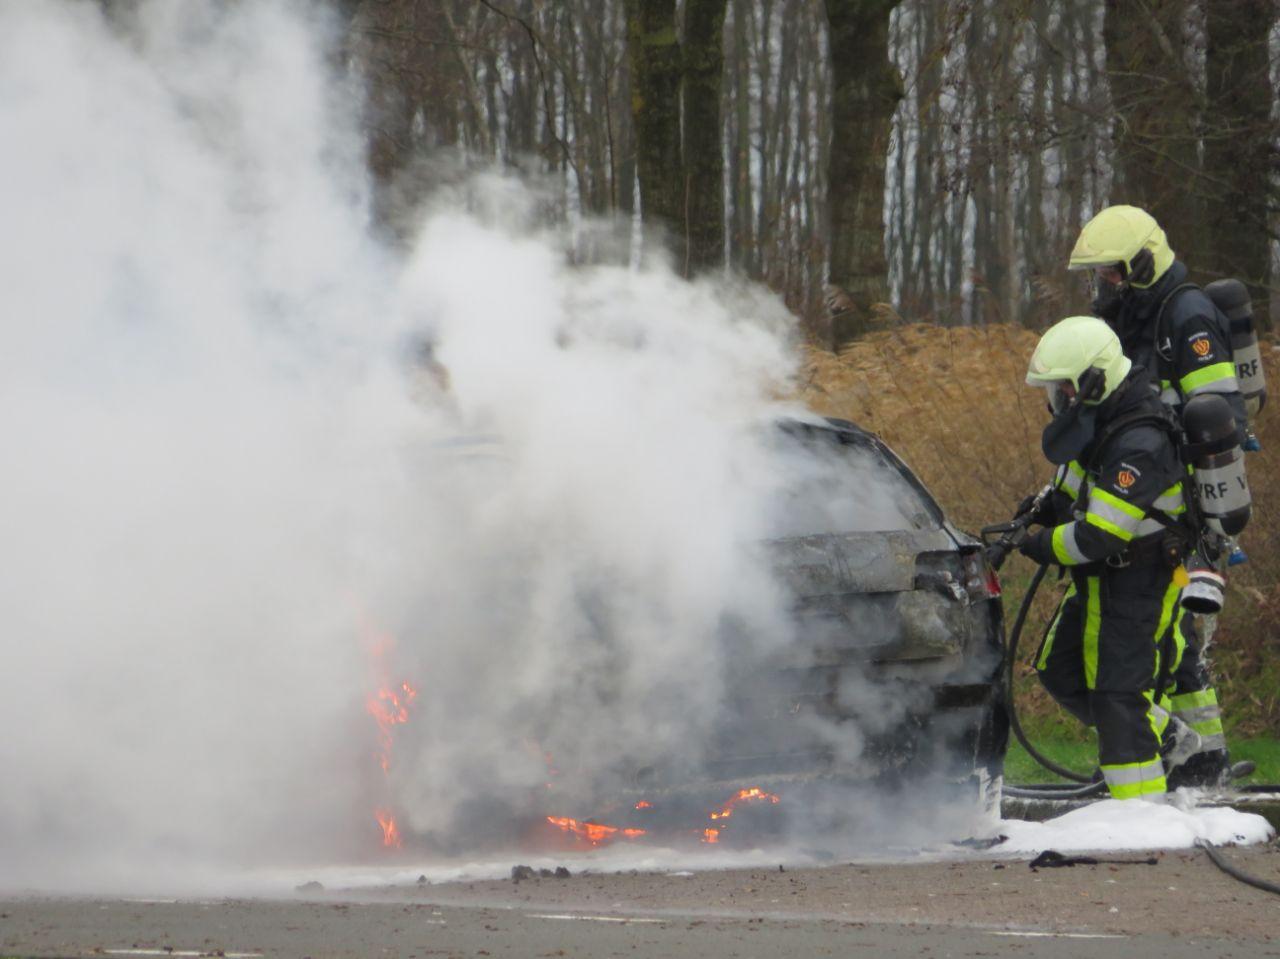 Auto verwoest door felle brand bjj de tankstation langs de A32 bij Oldeholtwolde